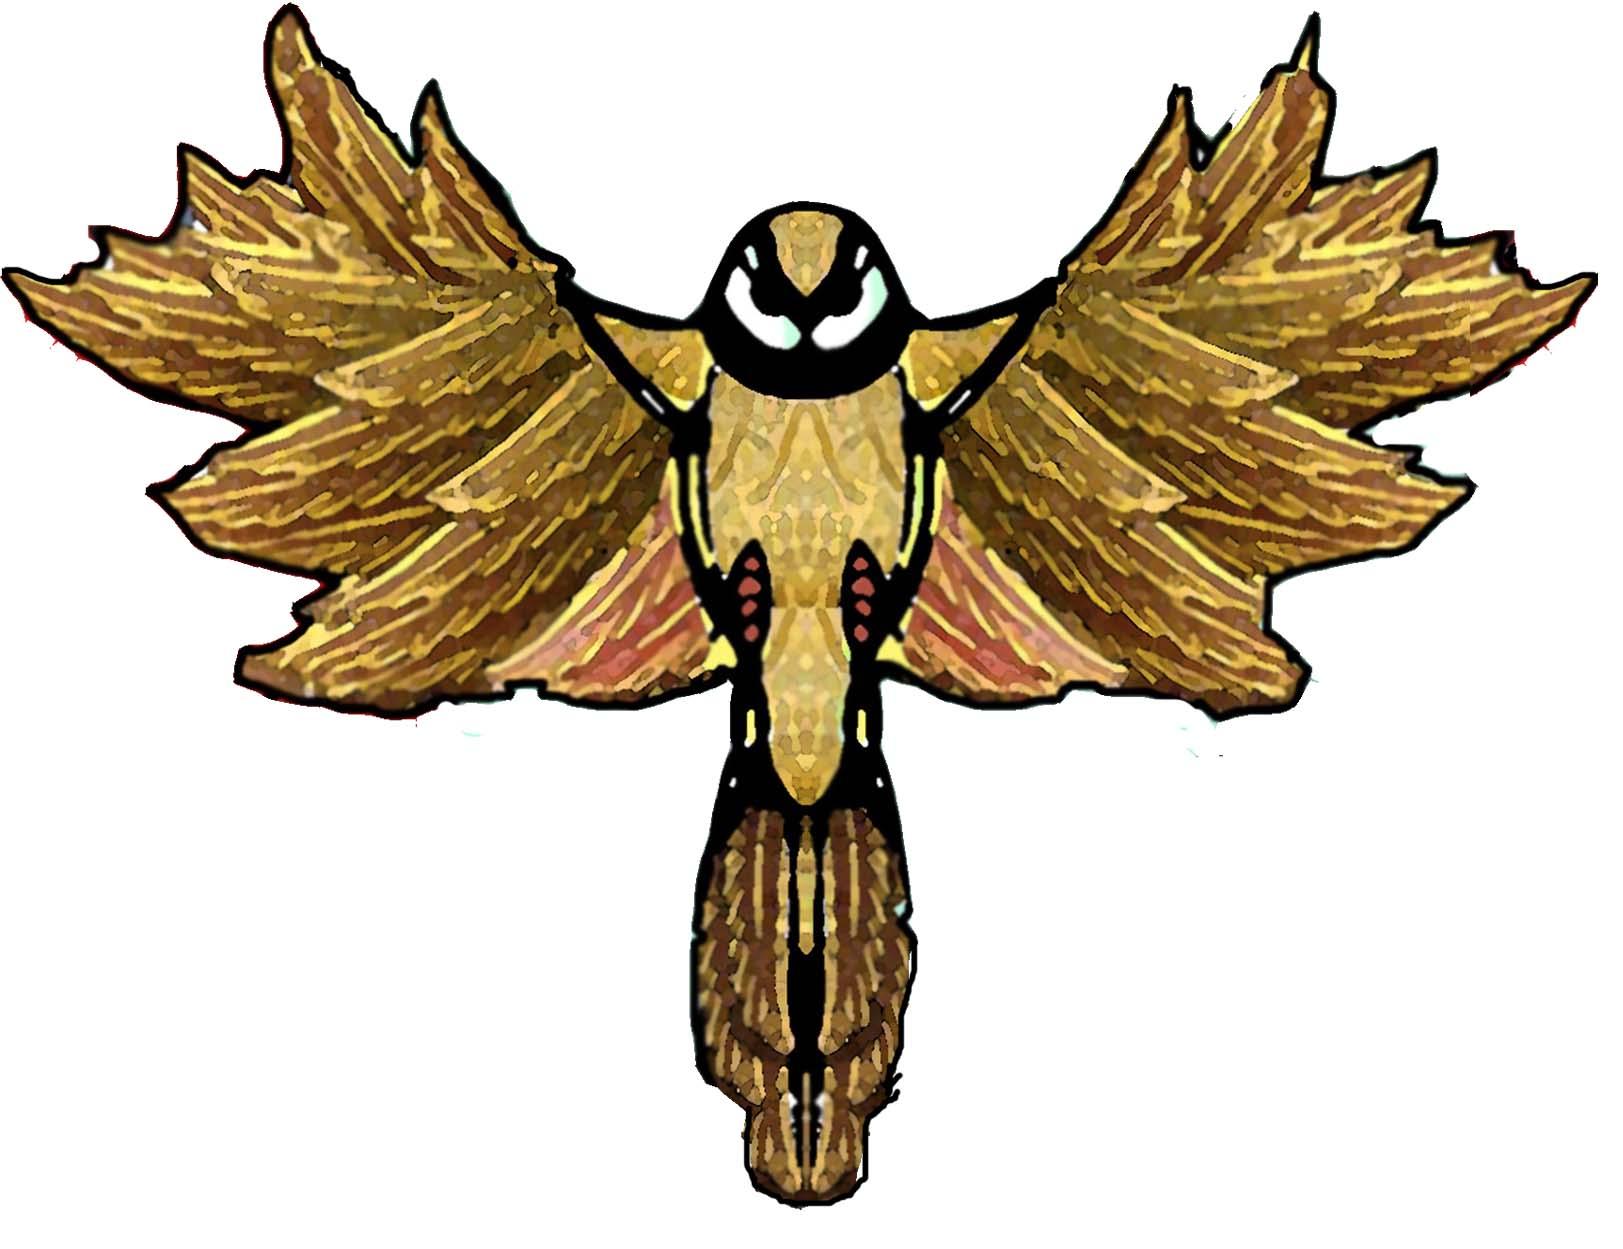 Goldenbluetitsmall